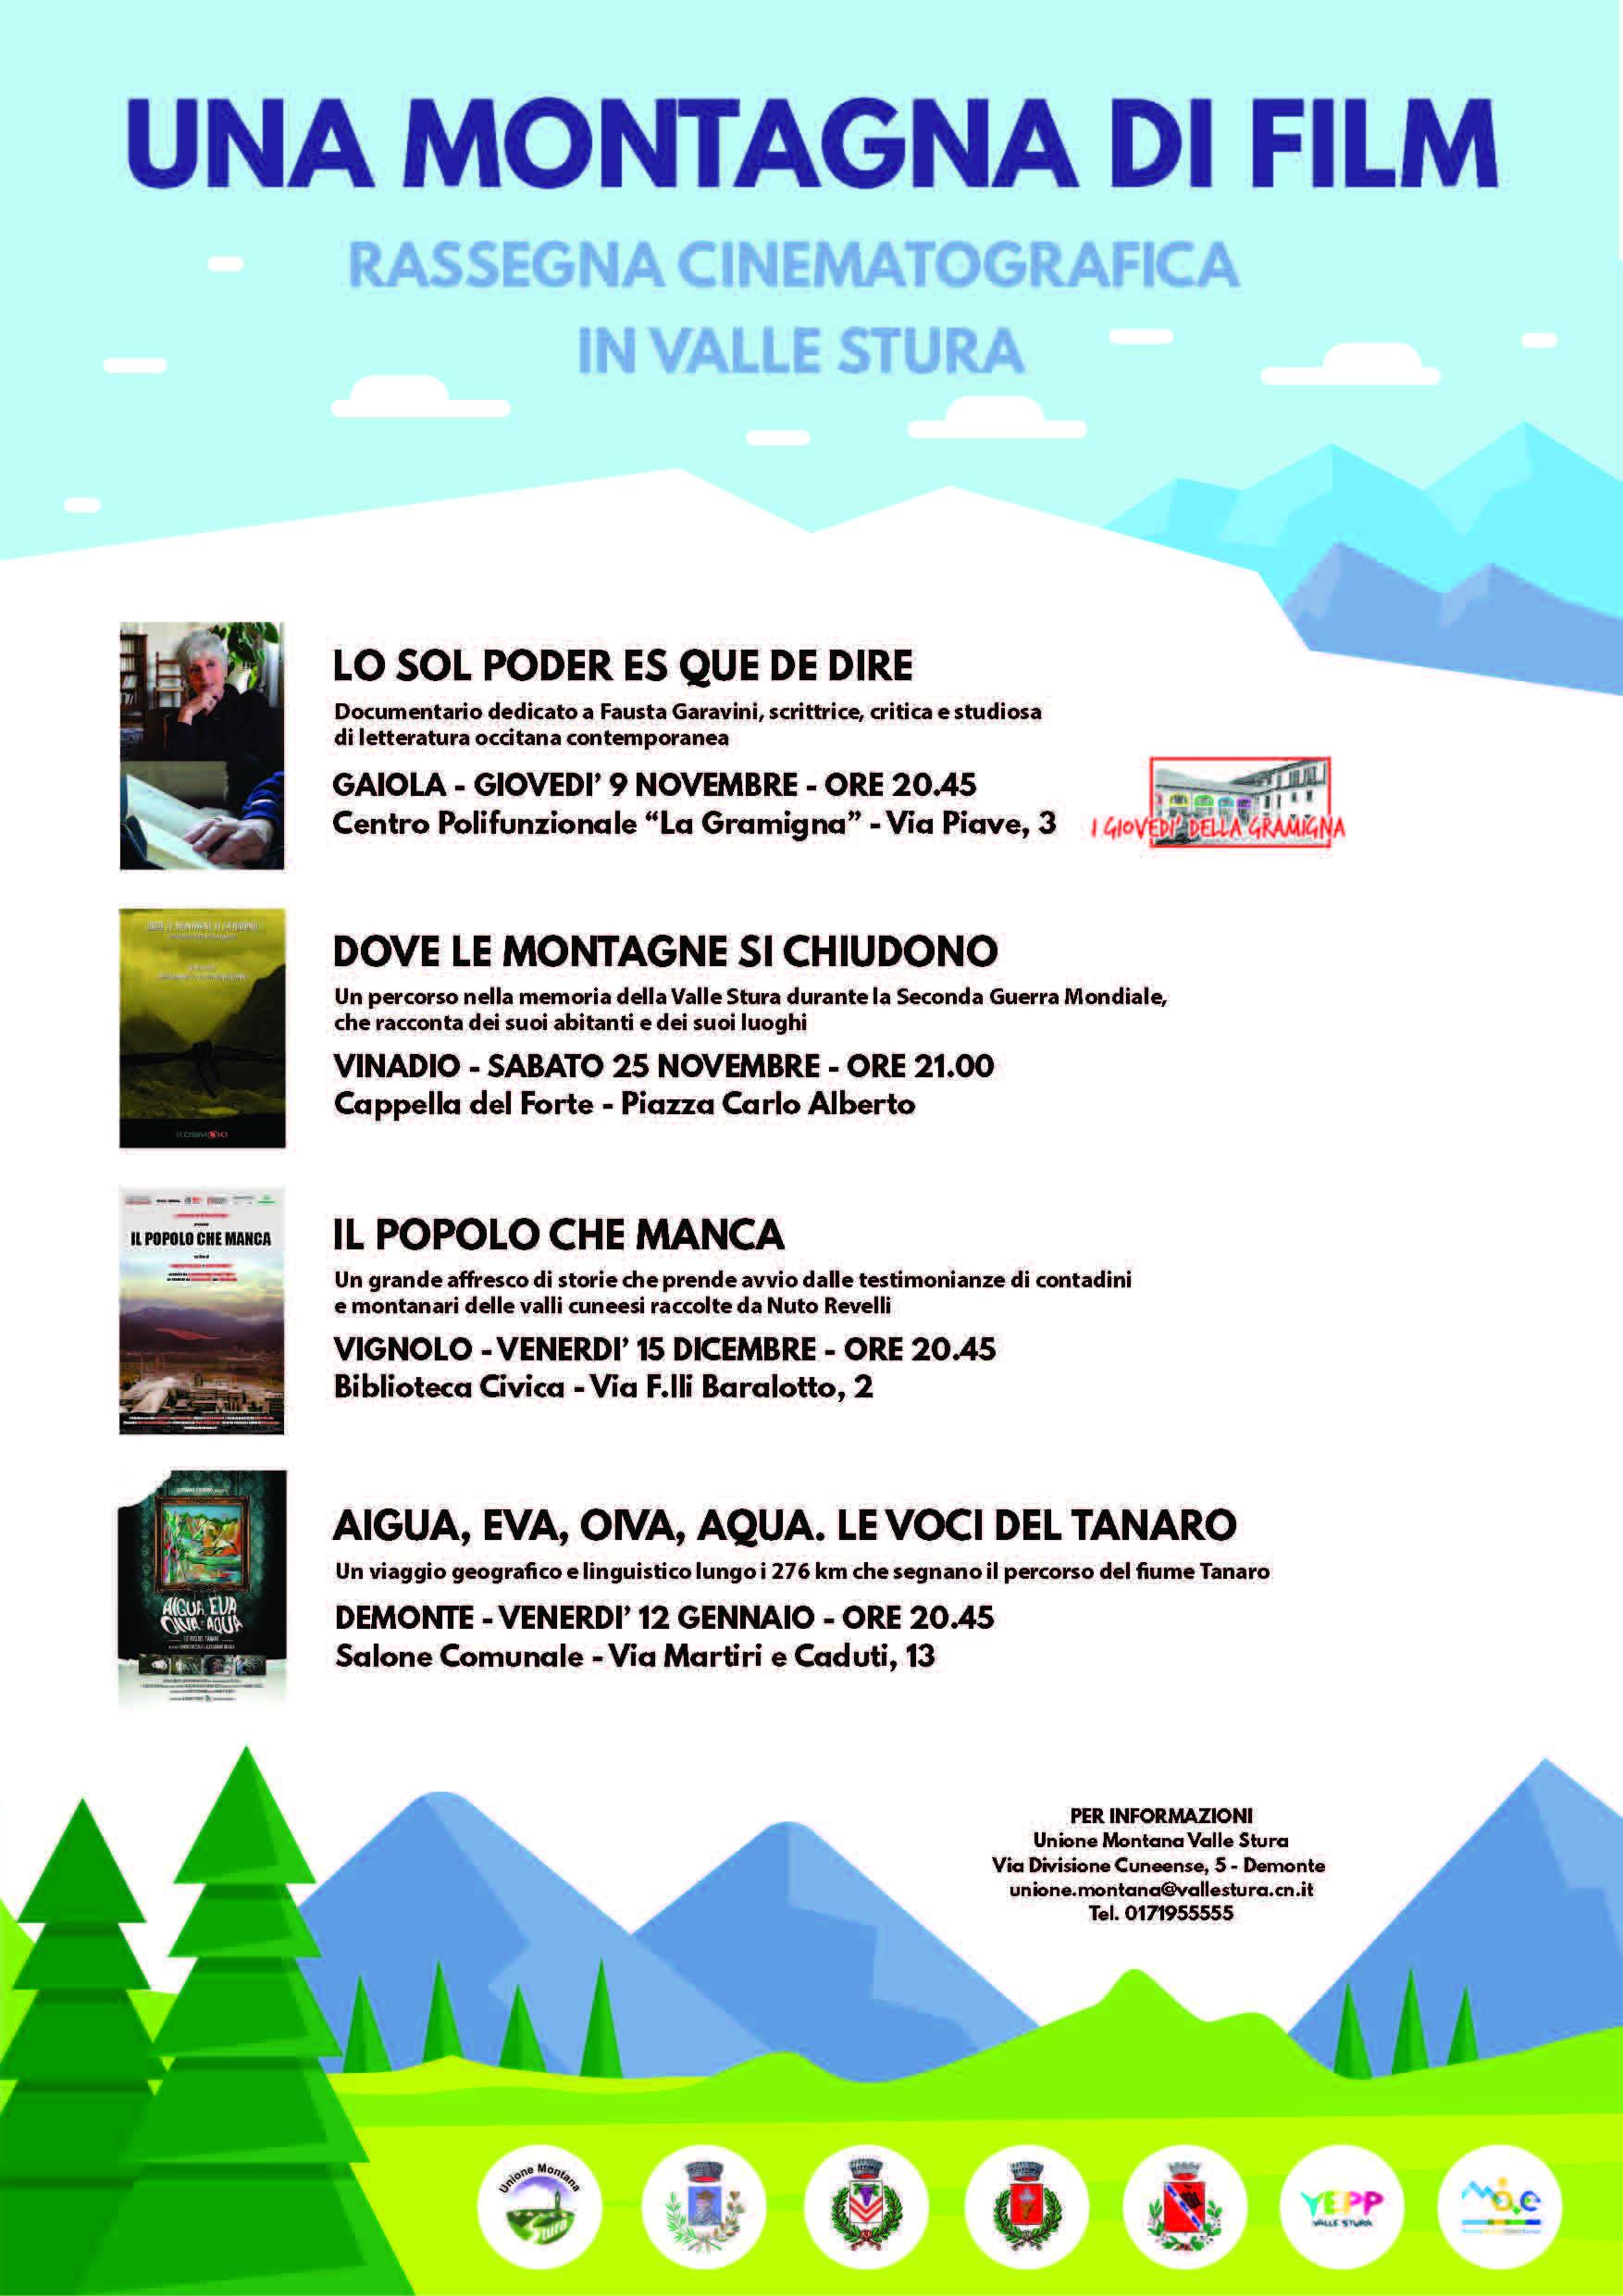 ARGENTERA: Una montagna di film 2019